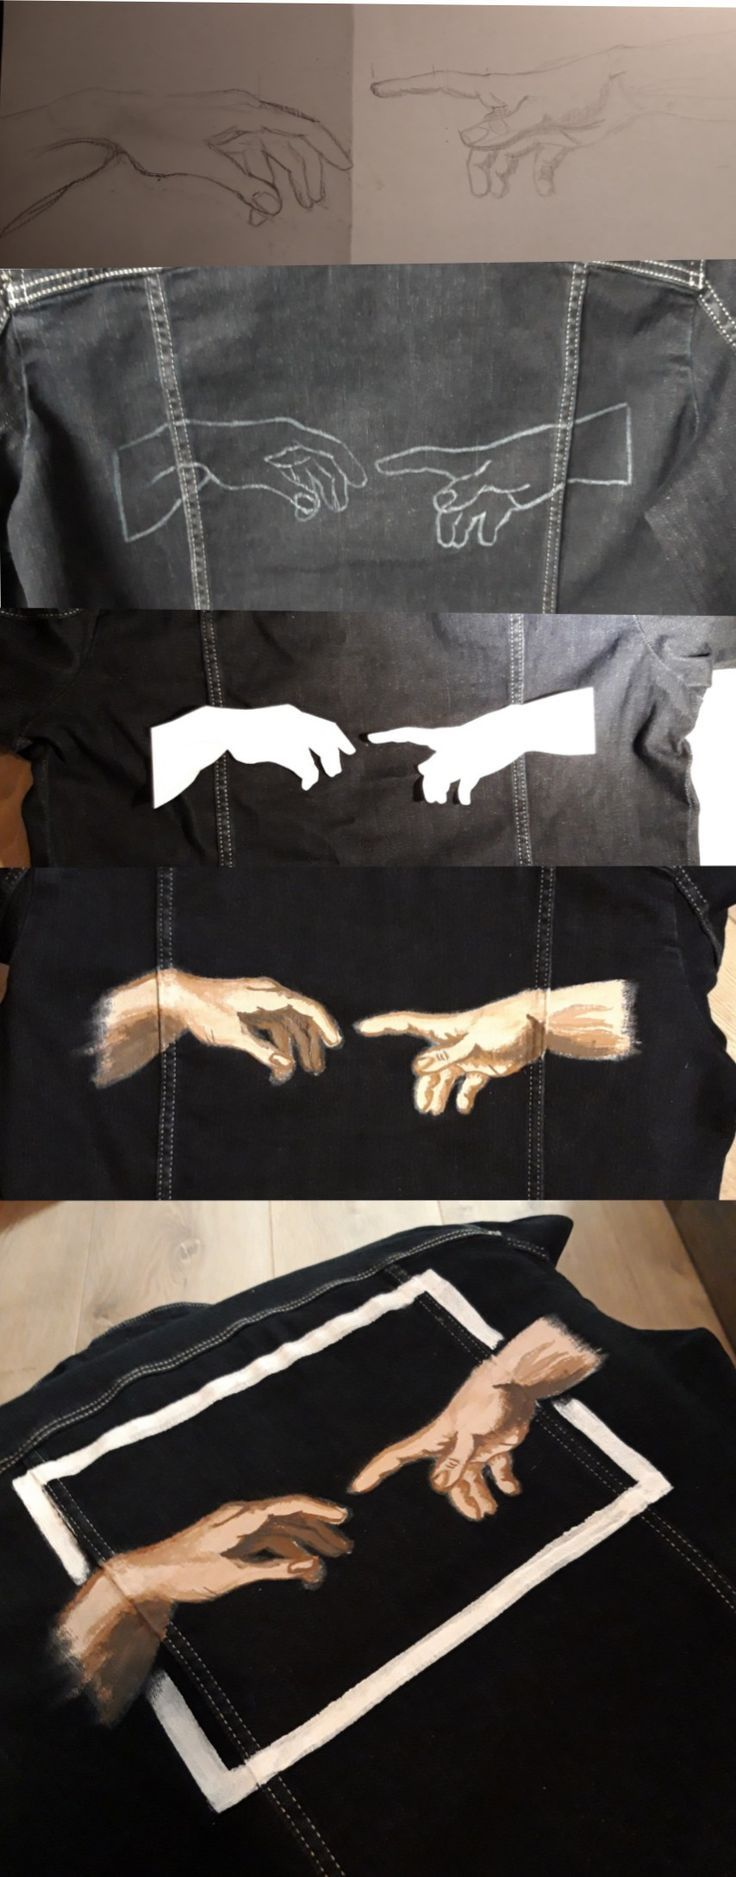 #wallpaper #lockscreen #art The Creation of Adam - Nell Oa. #jeanjacketoutfits